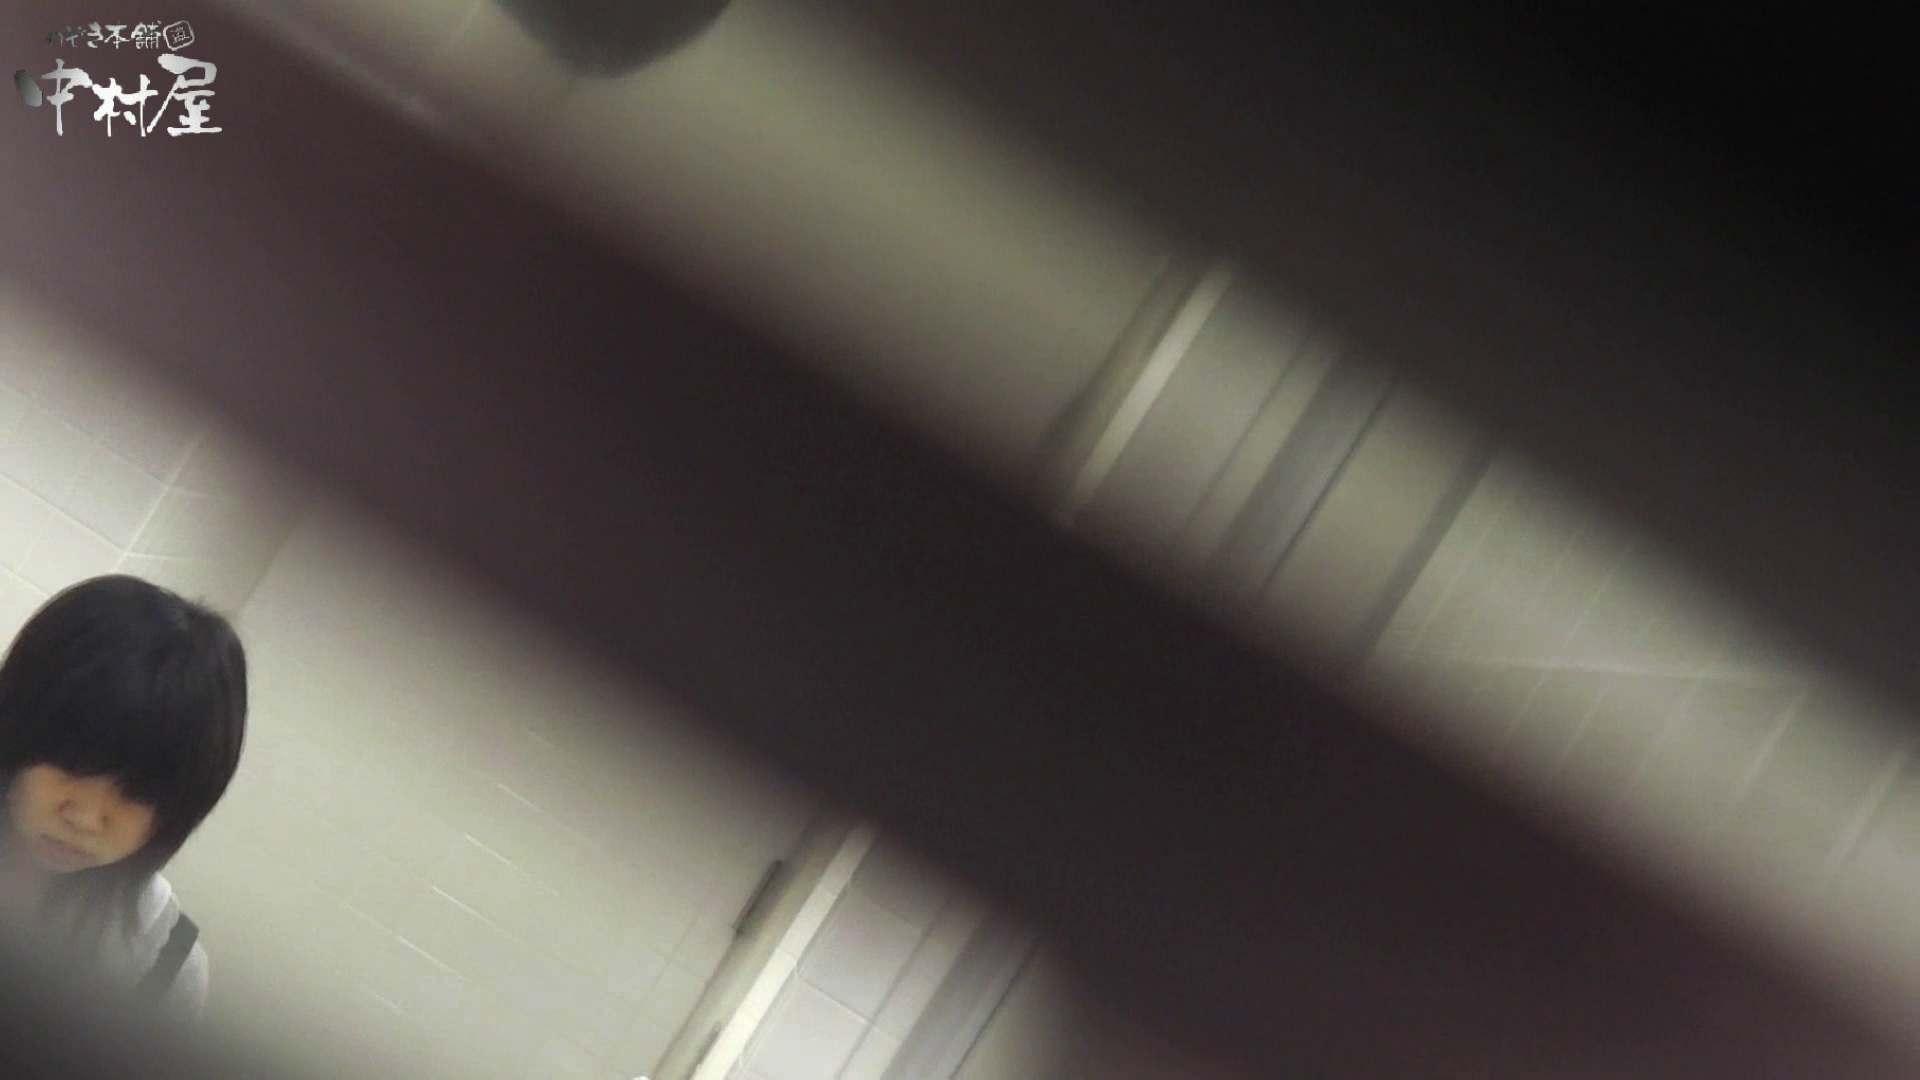 vol.54 命がけ潜伏洗面所! ヲリモノとろりん後編 プライベート アダルト動画キャプチャ 93連発 83